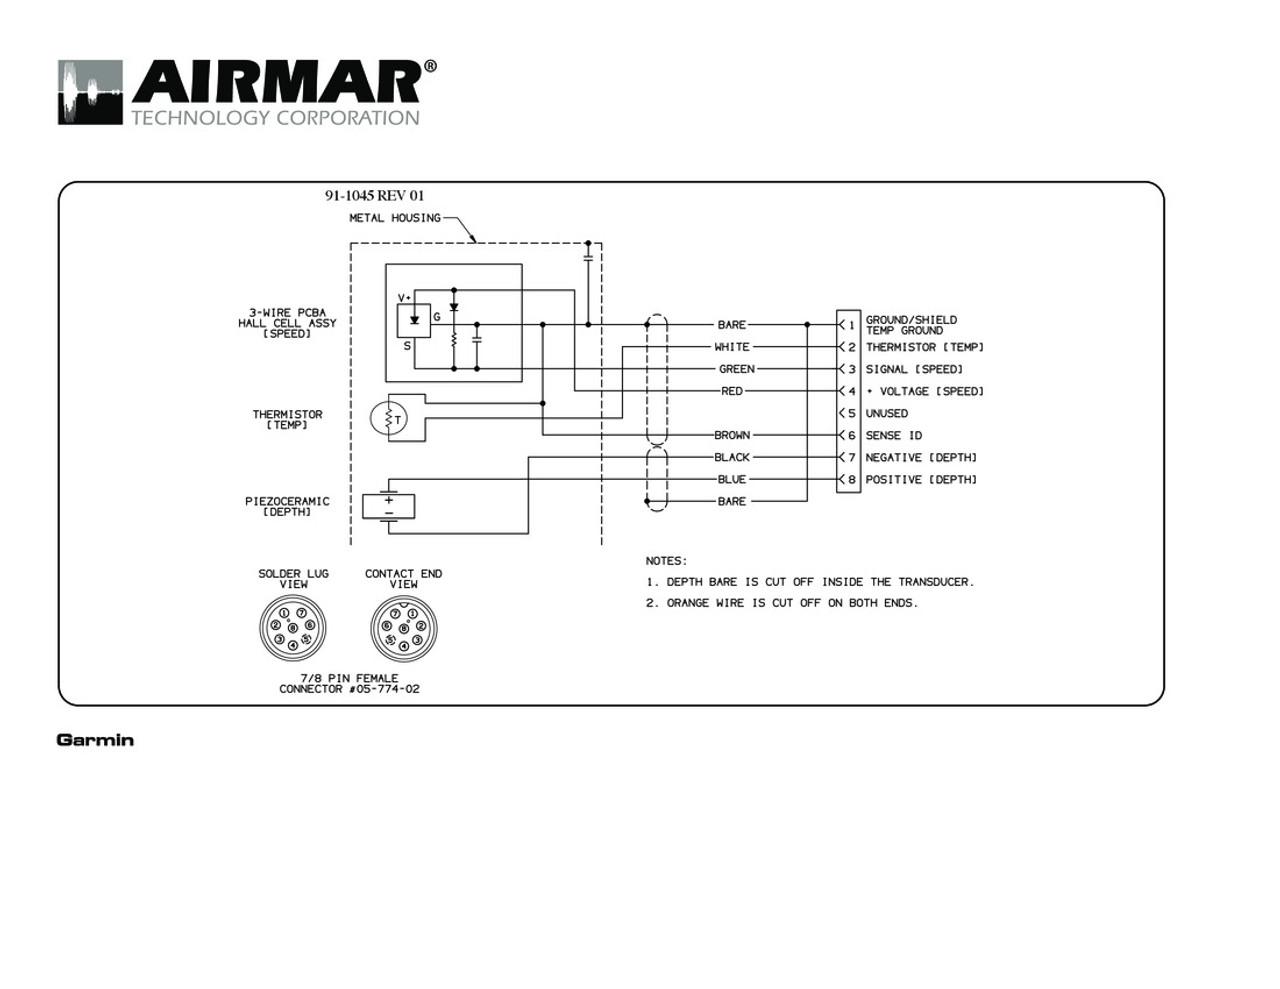 medium resolution of diagram for wiring 8 pin nr 51 use wiring diagram diagram for wiring 8 pin nr